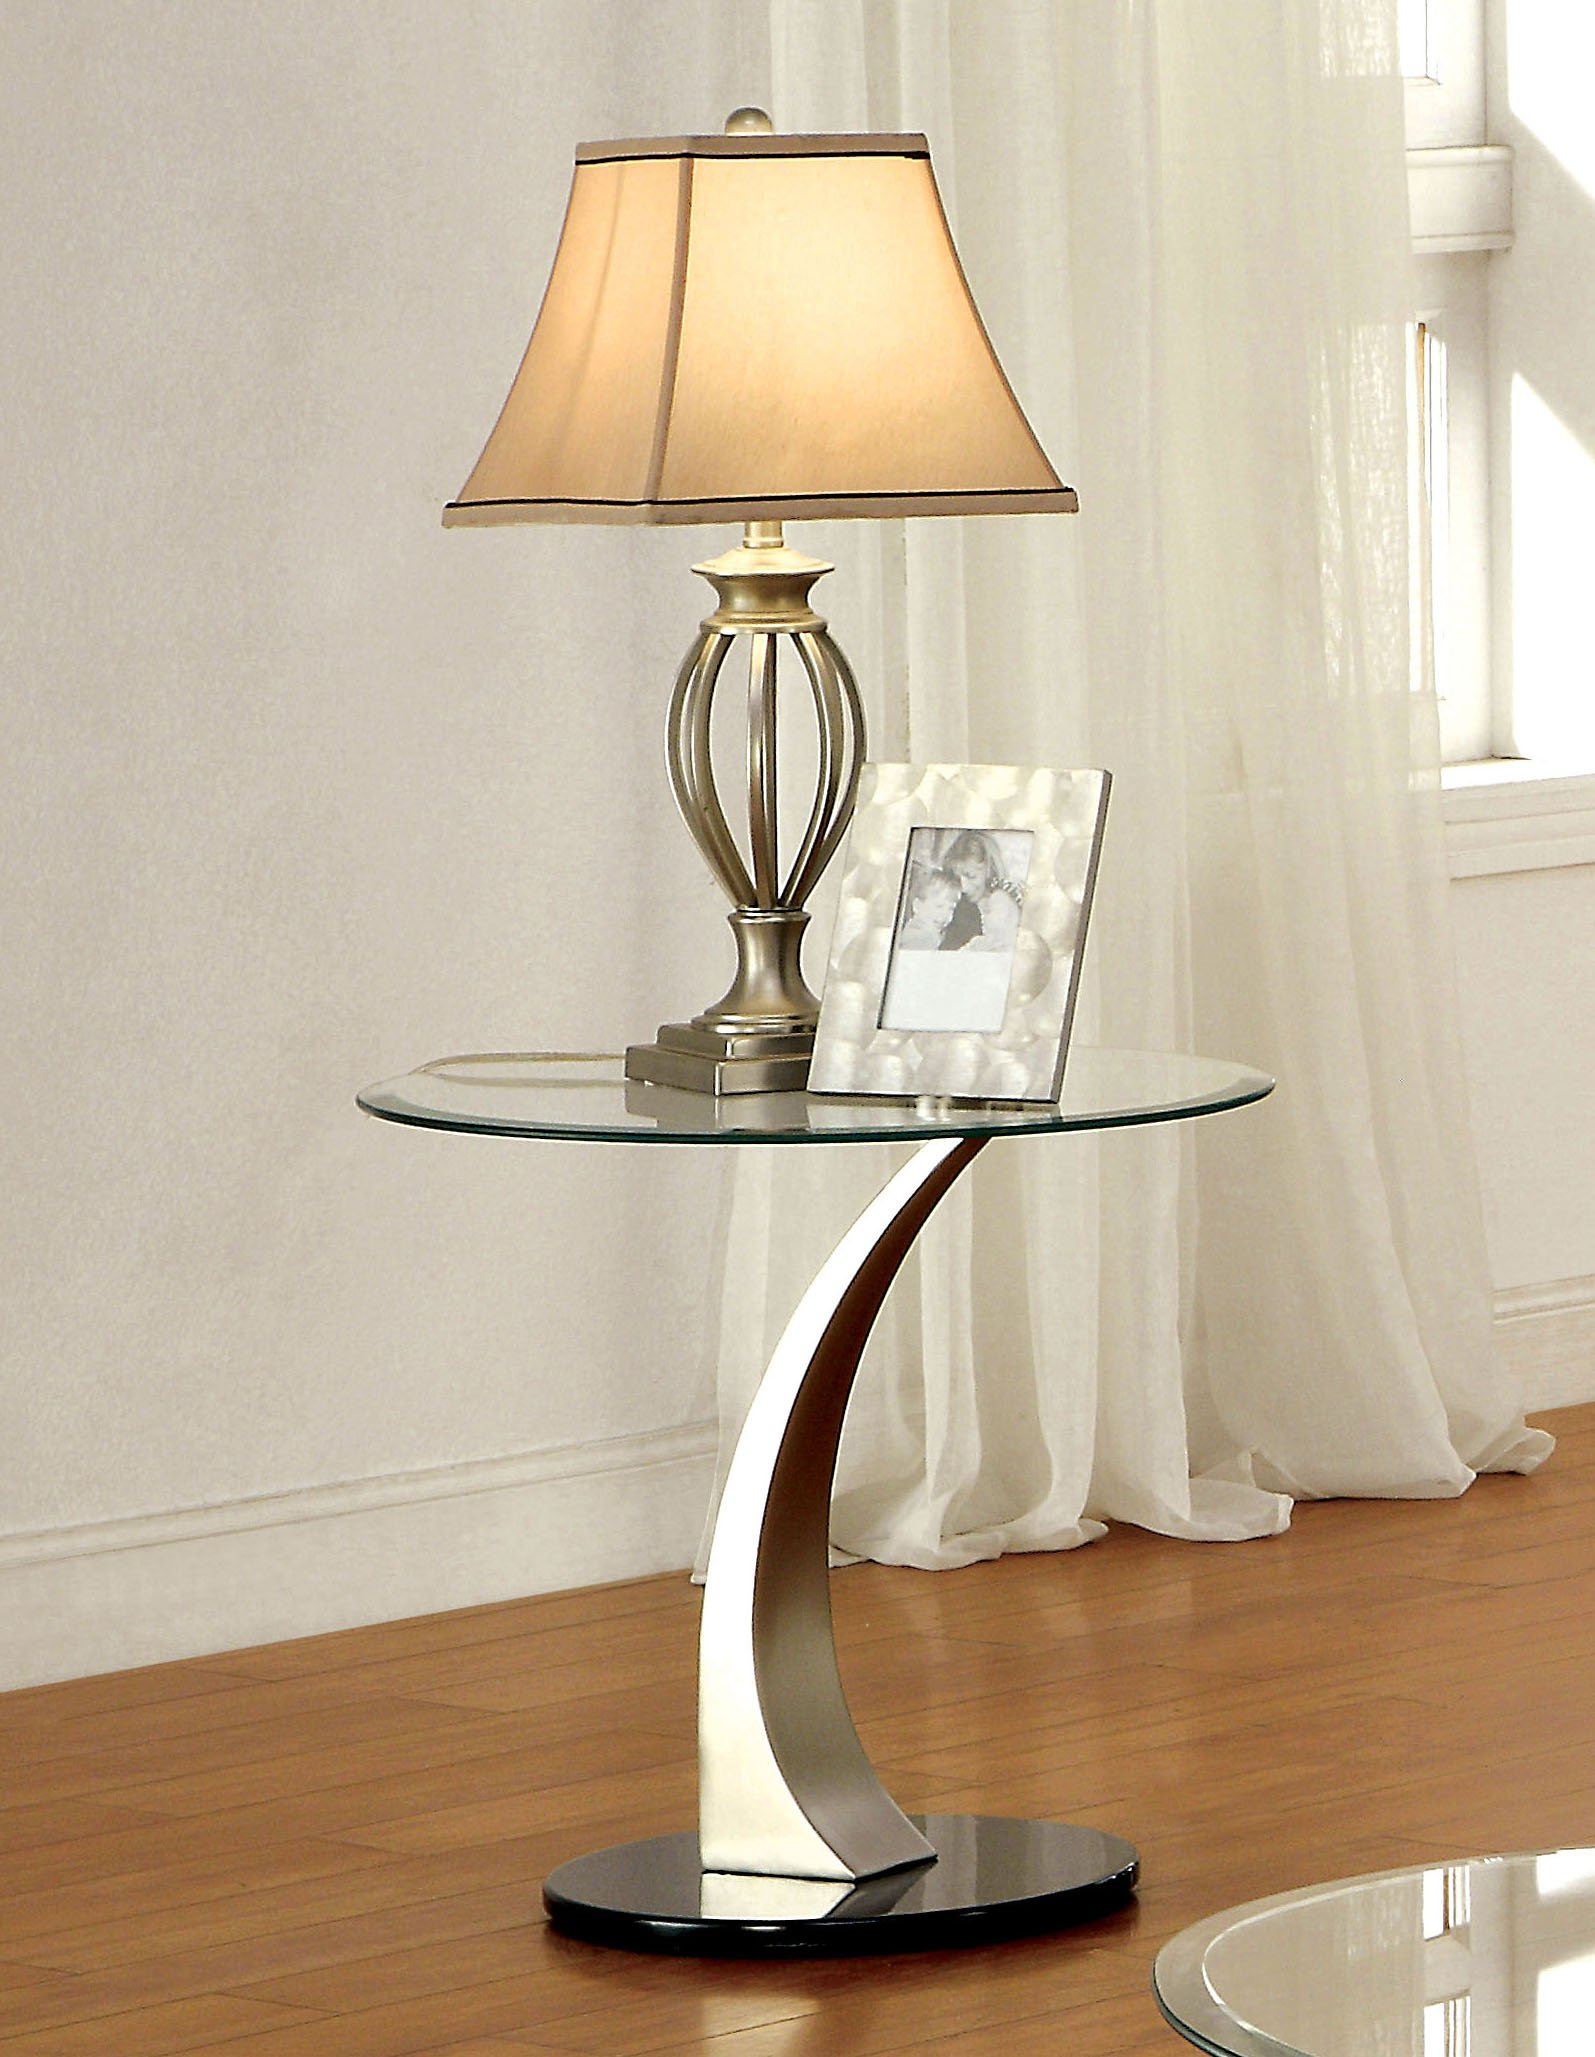 Furniture of America Kassandra Modern End Table, Metallic Finish by Furniture of America